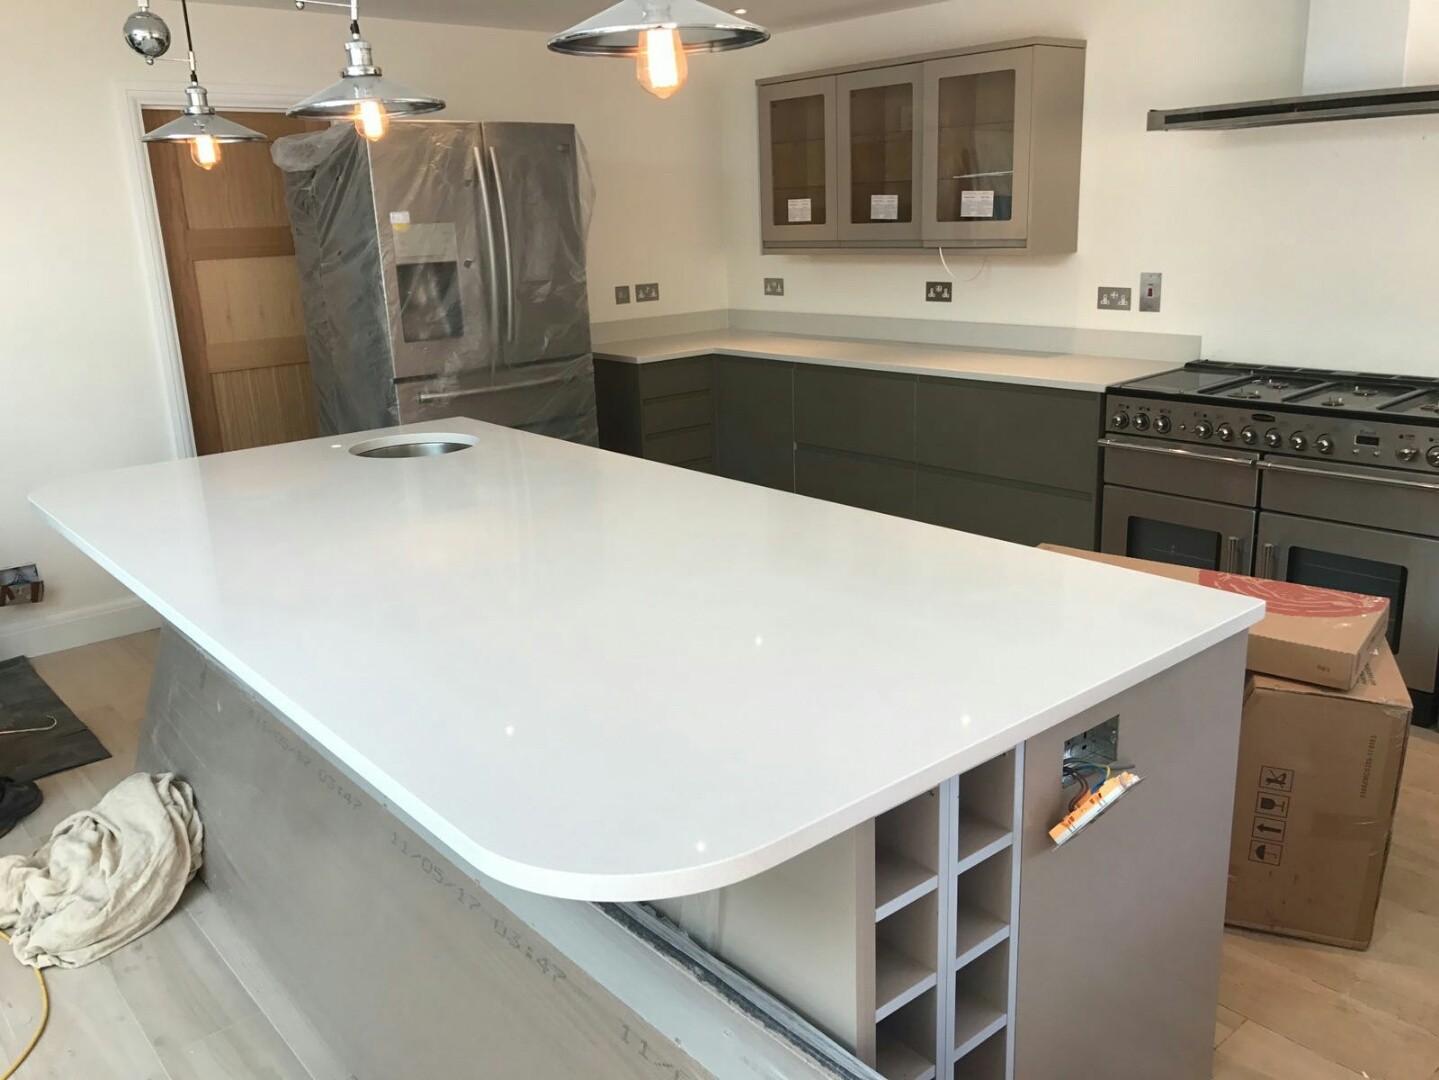 Bianco De Lusso - Amersham, Bucks - Rock and Co Granite Ltd